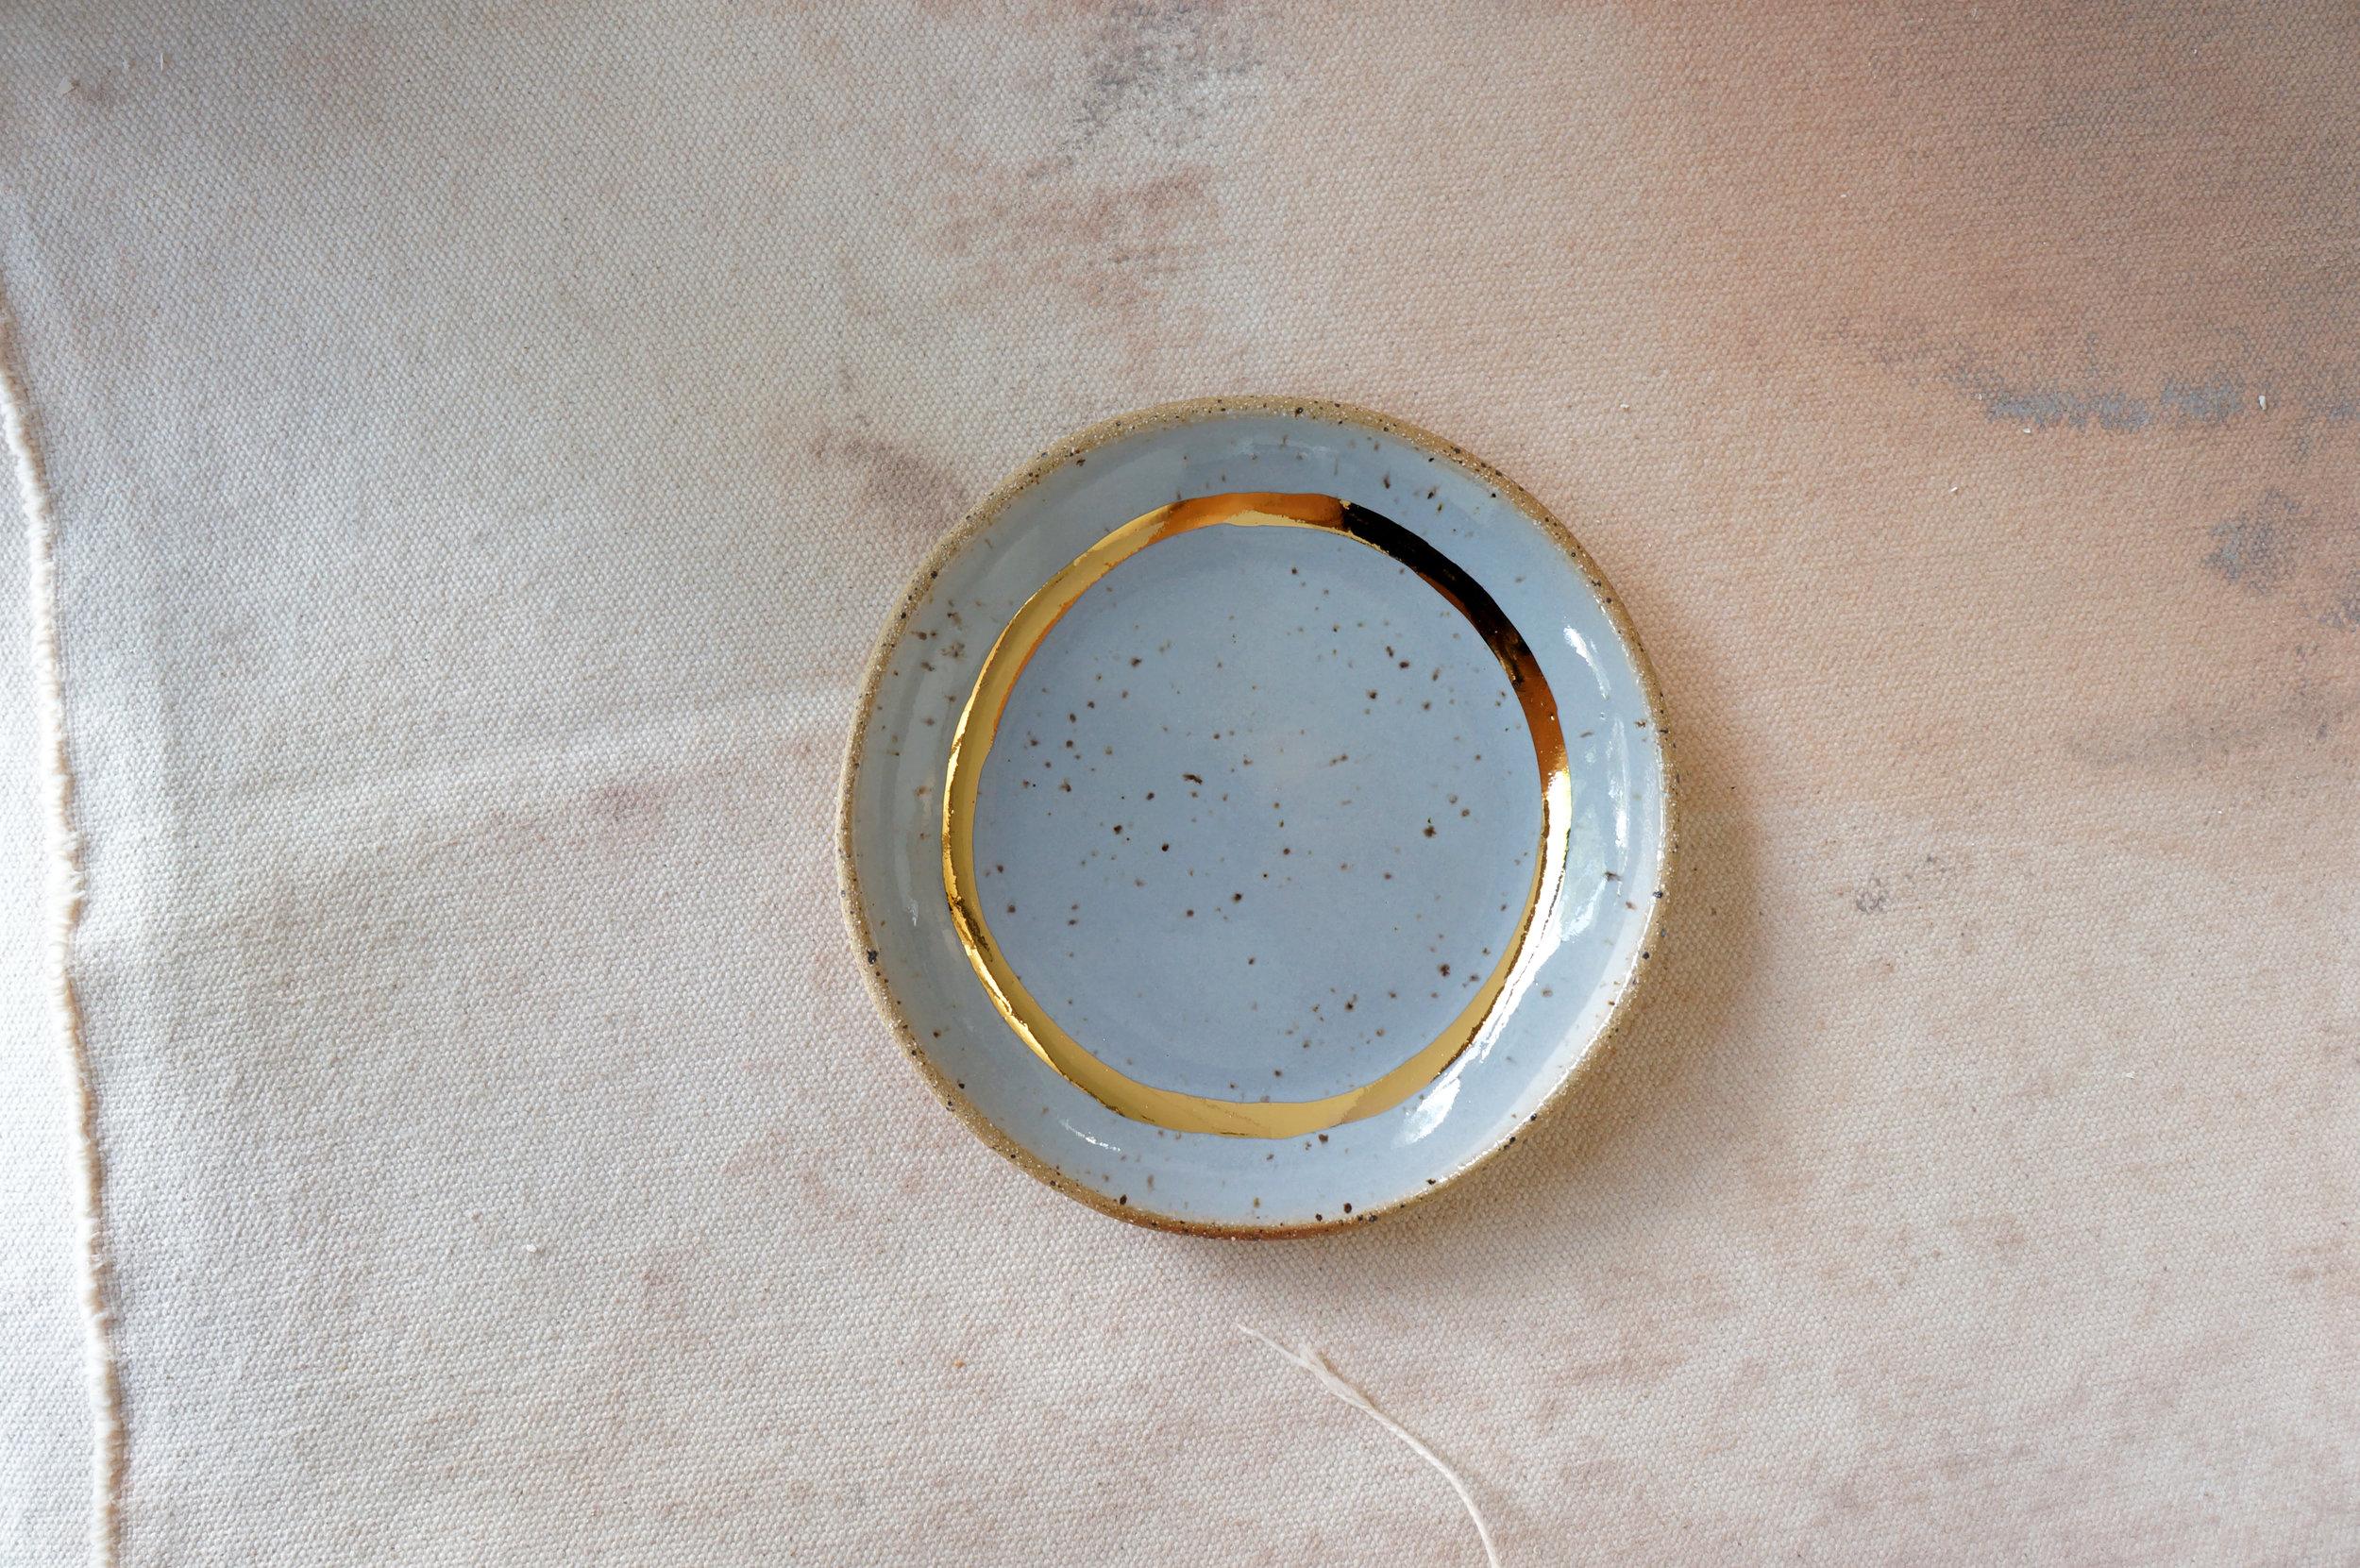 9. GRAY & GOLD RING DISH